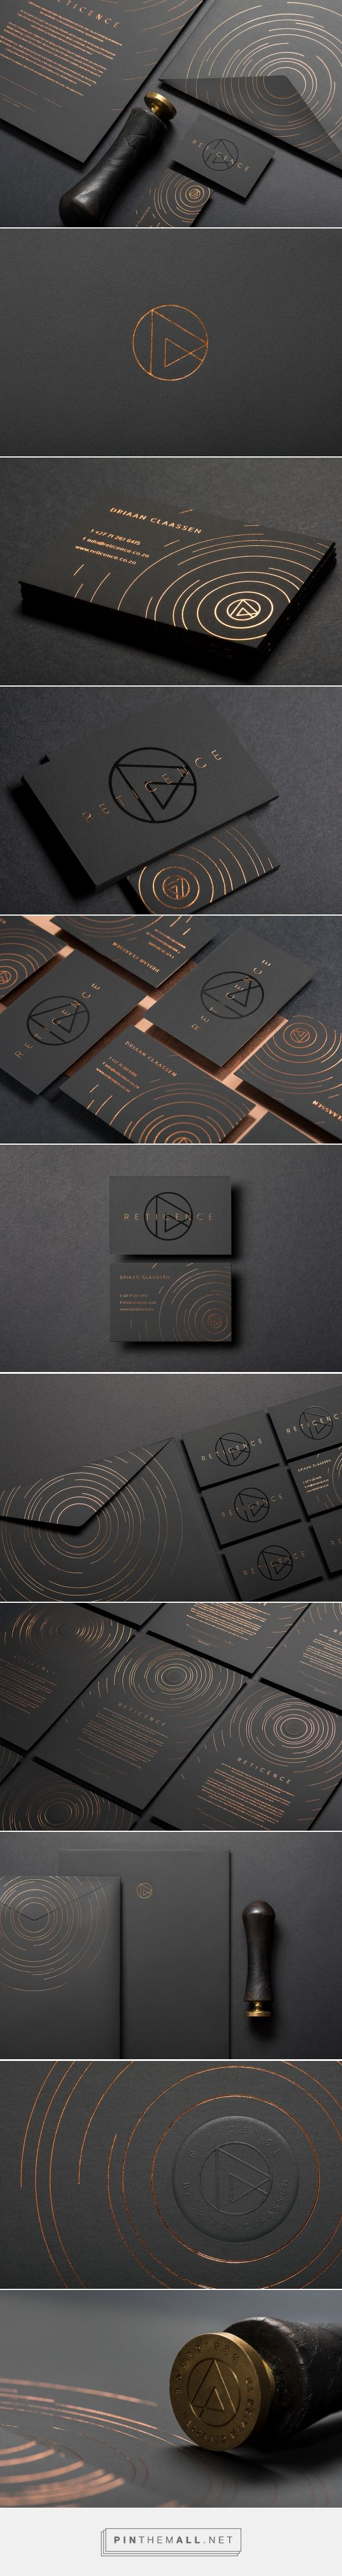 Reticence Sculptor Branding by Erwin Bindeman | Fivestar Branding Agency – Design and Branding Agency & Curated Inspiration Gallery  #branding #brand #businesscards #design #designinspiration